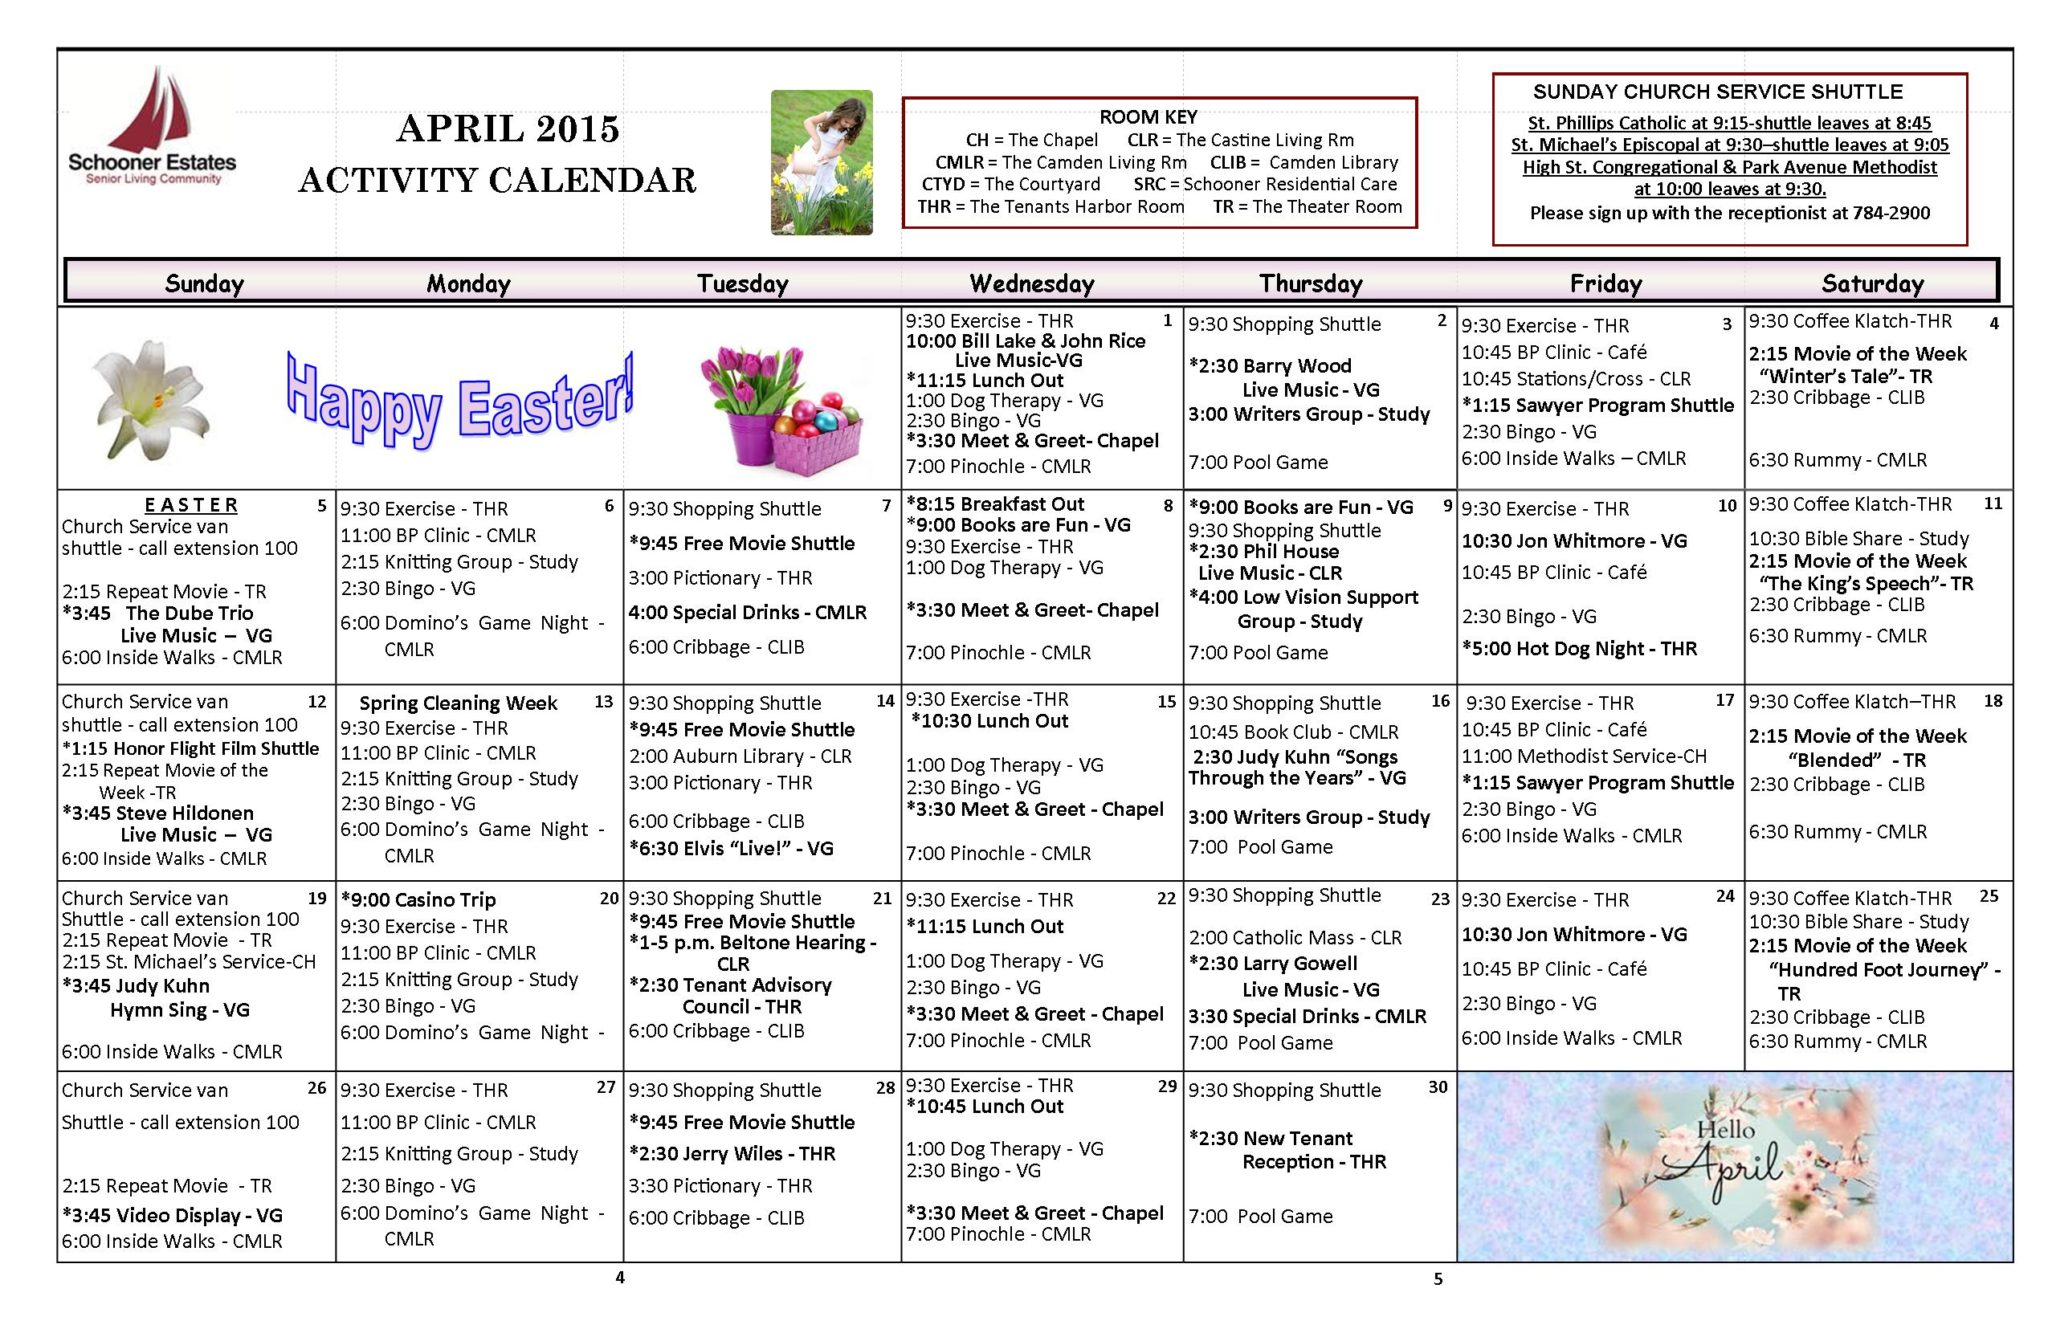 April 2015 activity calendar